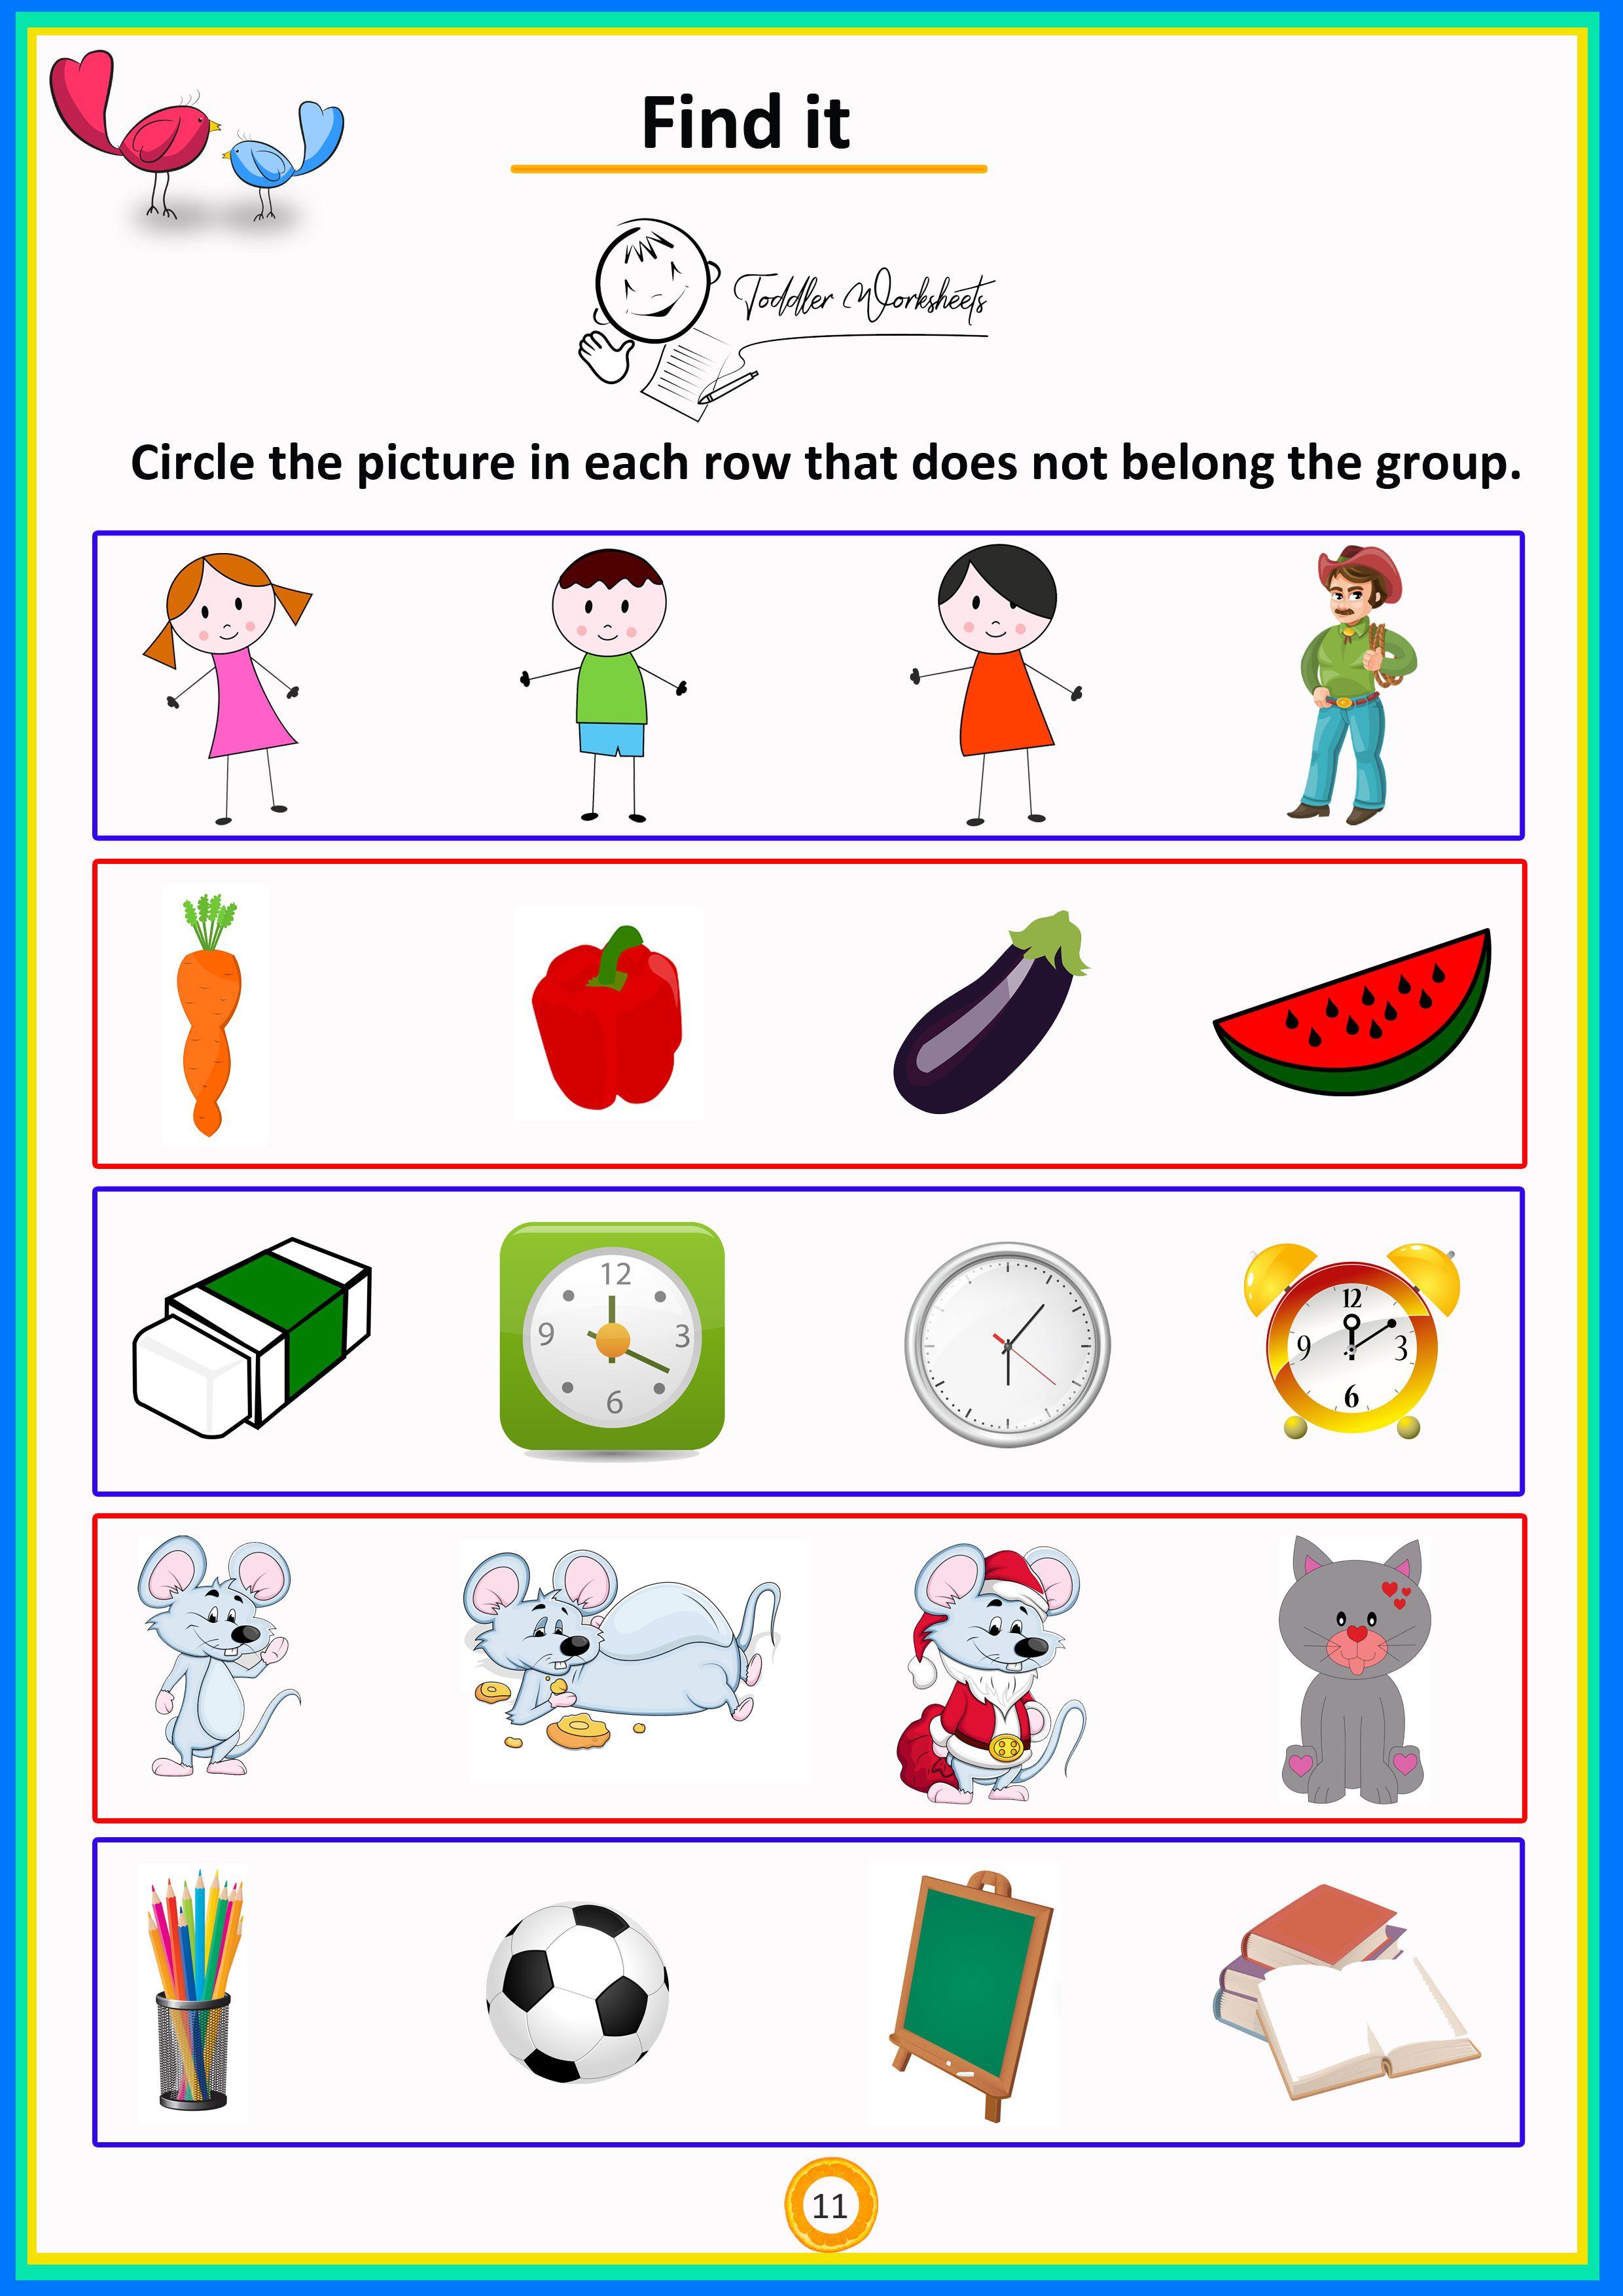 Find It 3 Free Toddler Preschool Simple Math Worksheet Preschool Math Worksheets Preschool Winter Math Winter Math Worksheets [ 3508 x 2480 Pixel ]